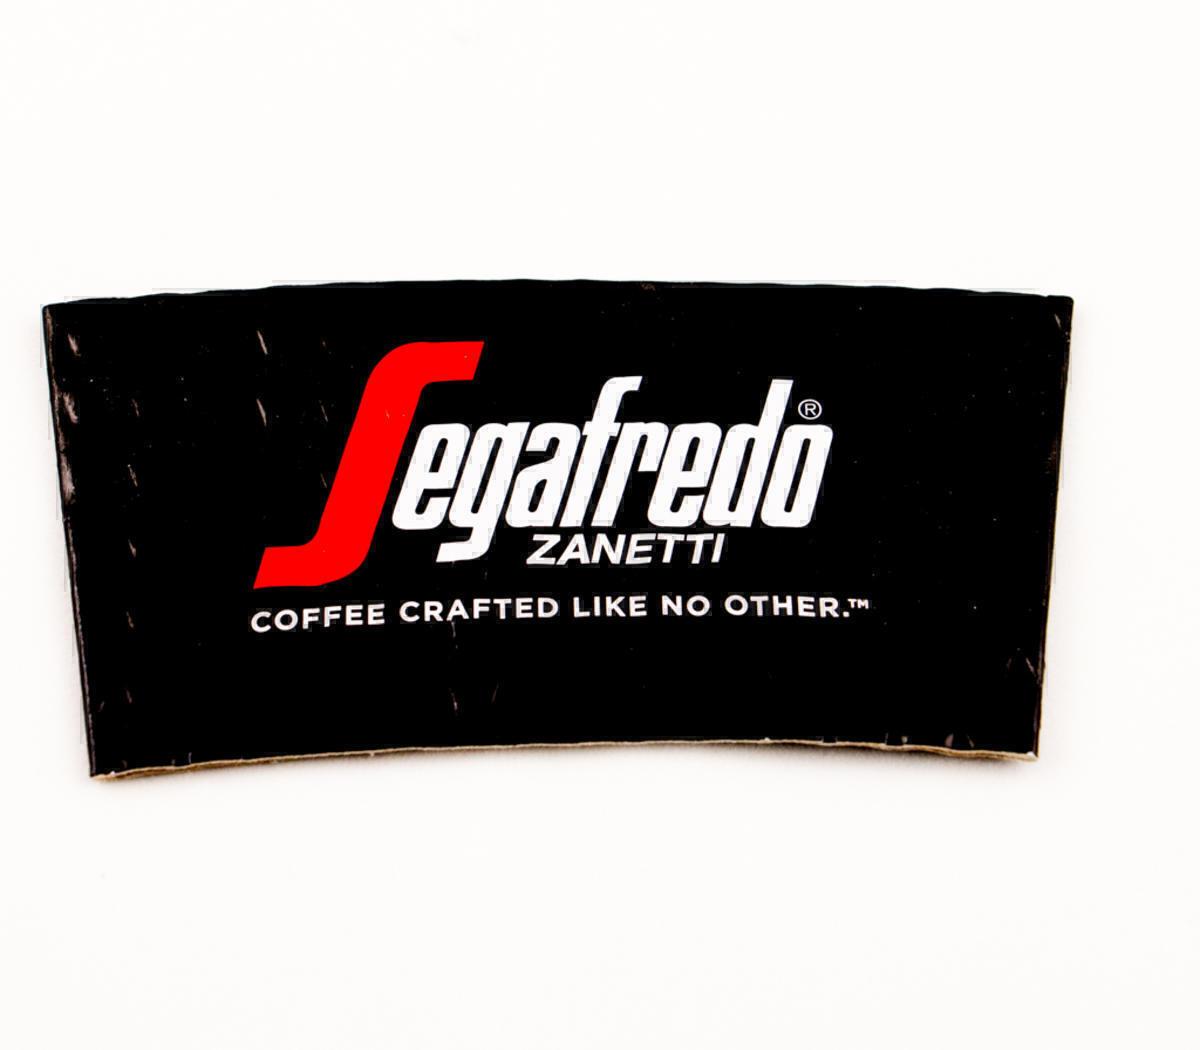 Segafredo Zanetti Branded Cup Sleeve